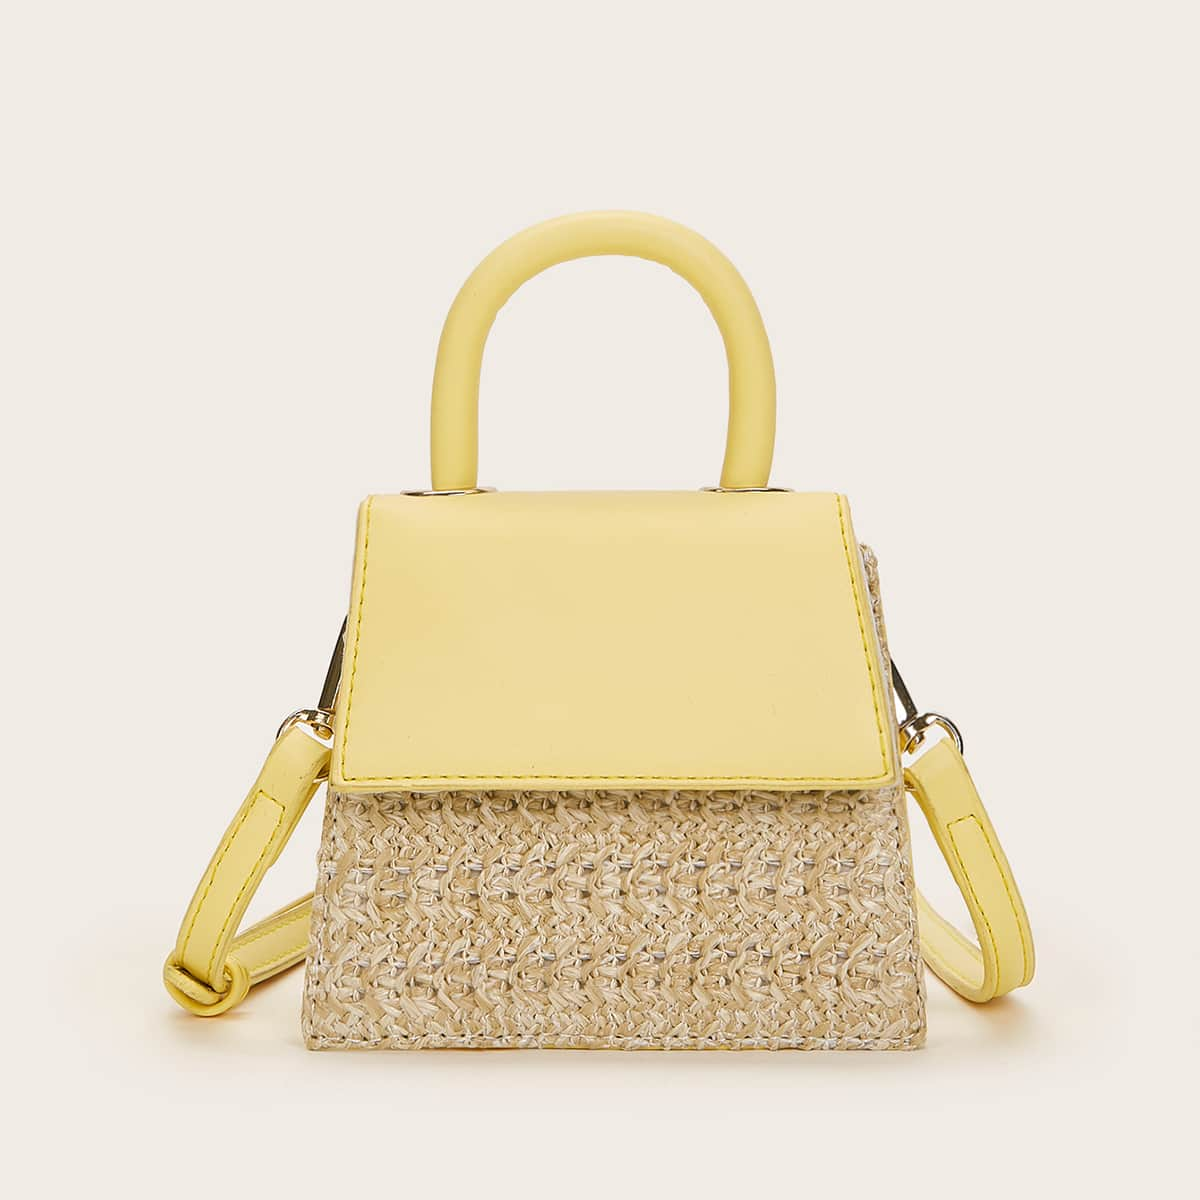 SHEIN / Mini Straw Panel Satchel Bag